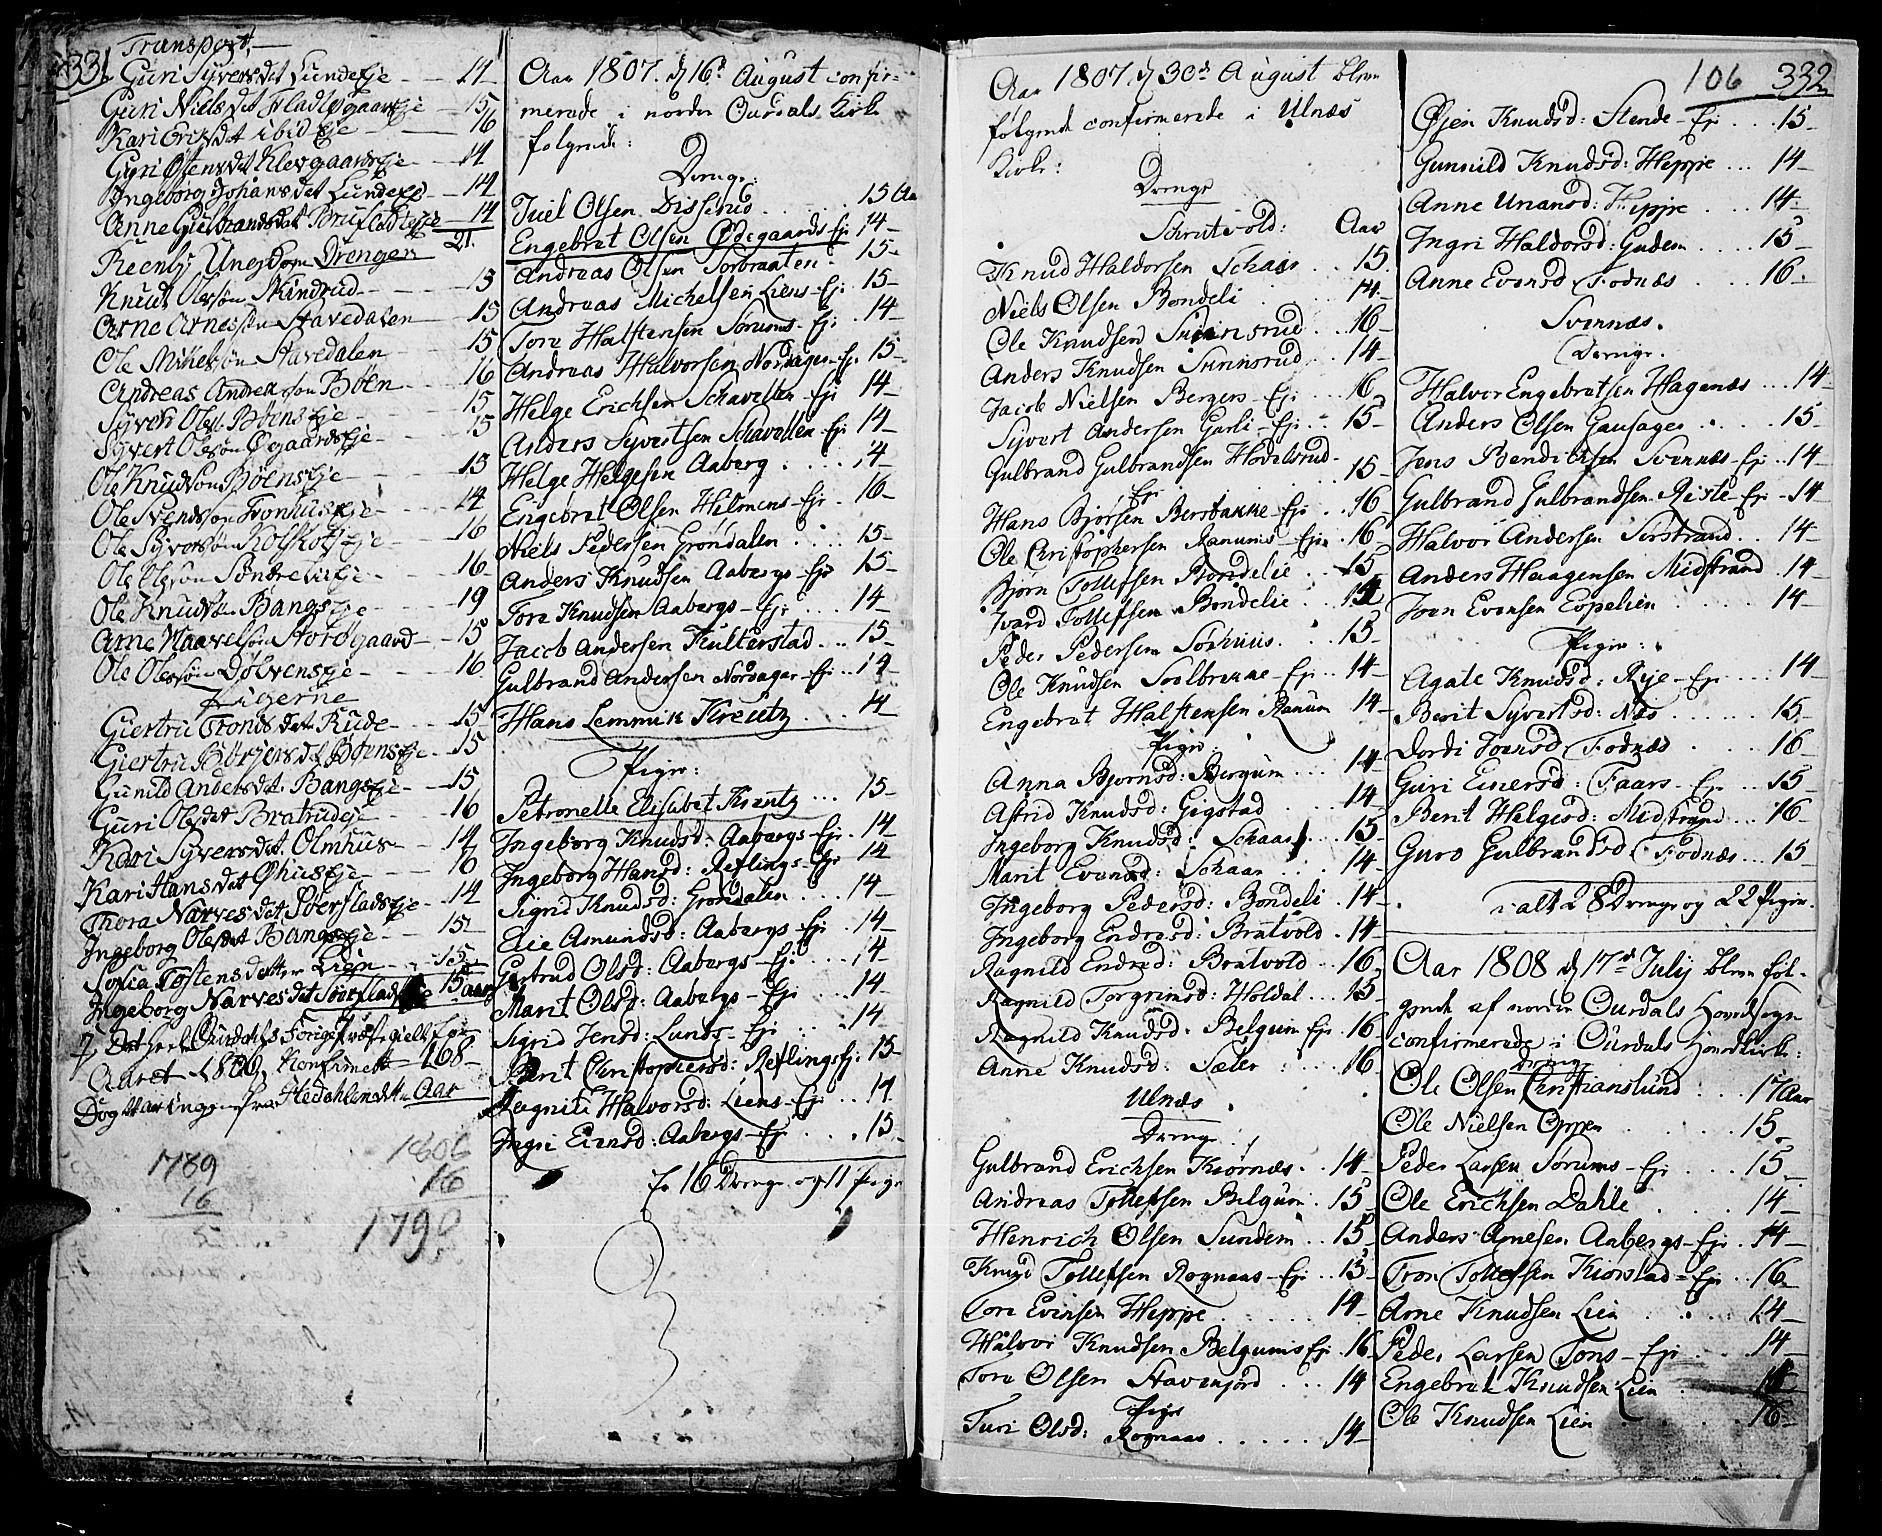 SAH, Aurdal prestekontor, Ministerialbok nr. 7, 1800-1808, s. 106